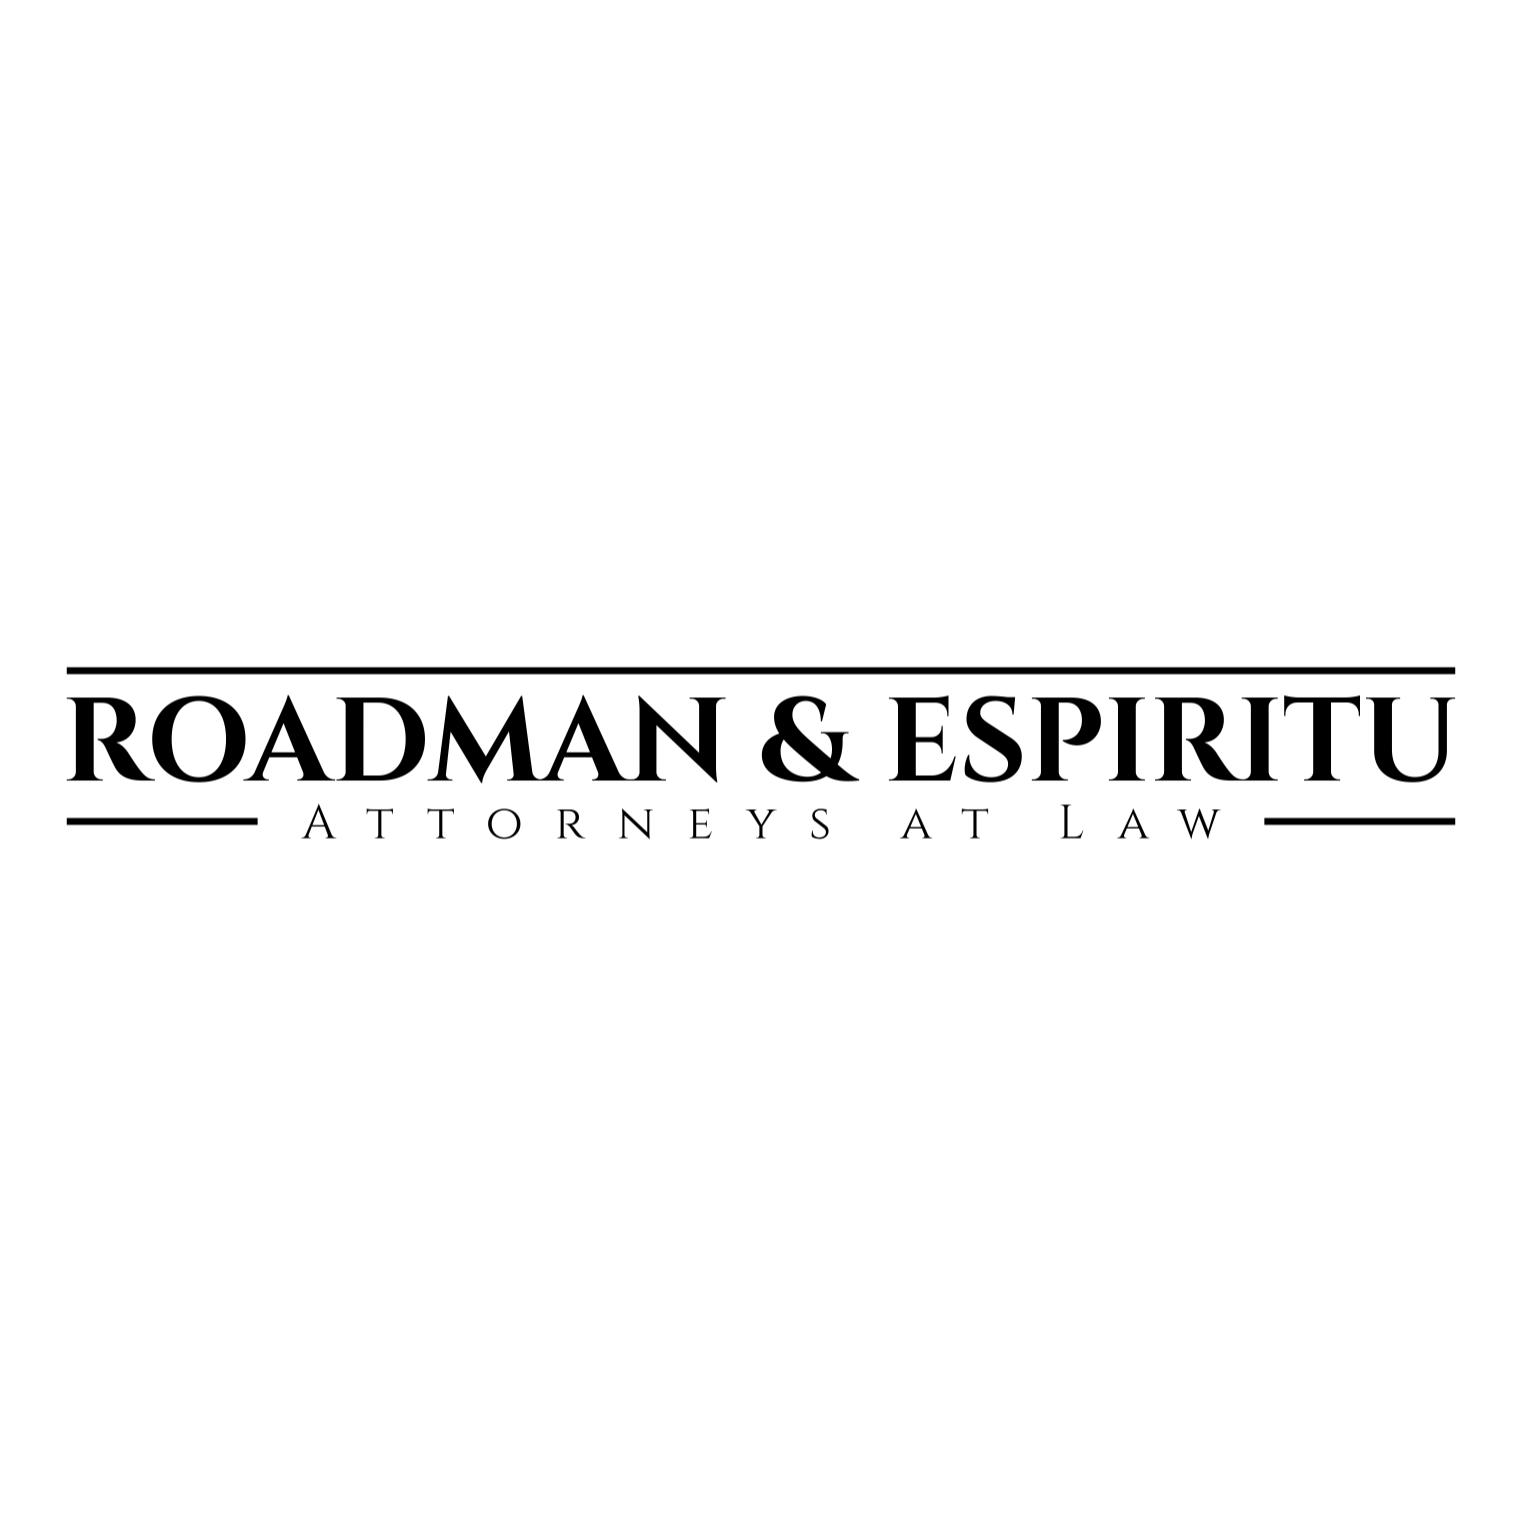 The Law Office of Roadman & Espiritu